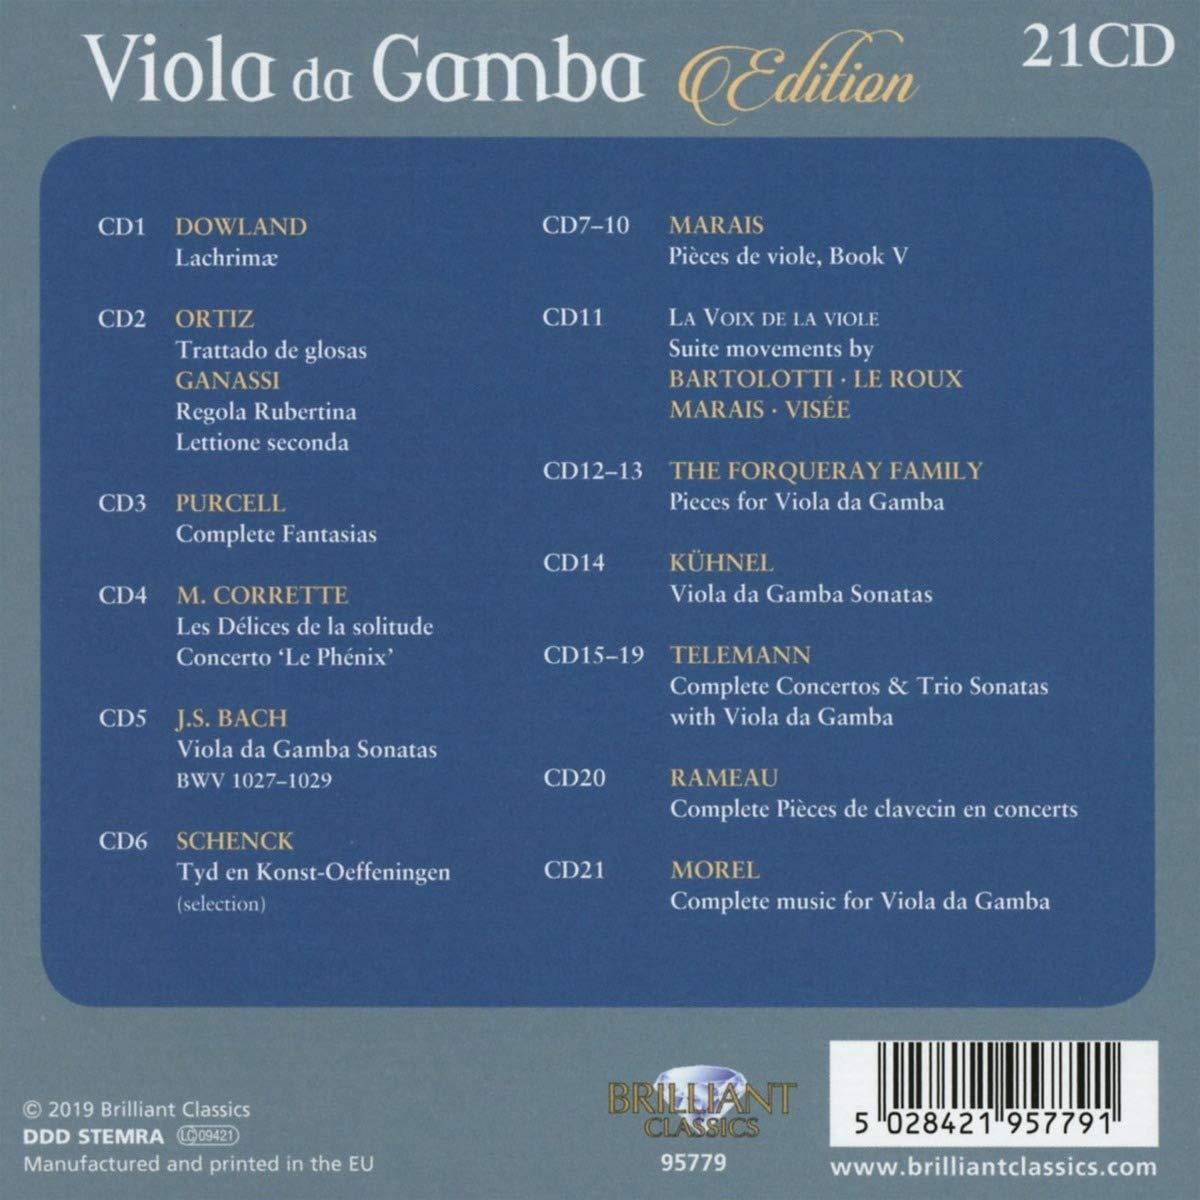 VARIOUS ARTISTS - Viola Da Gamba Edition - Amazon.com Music